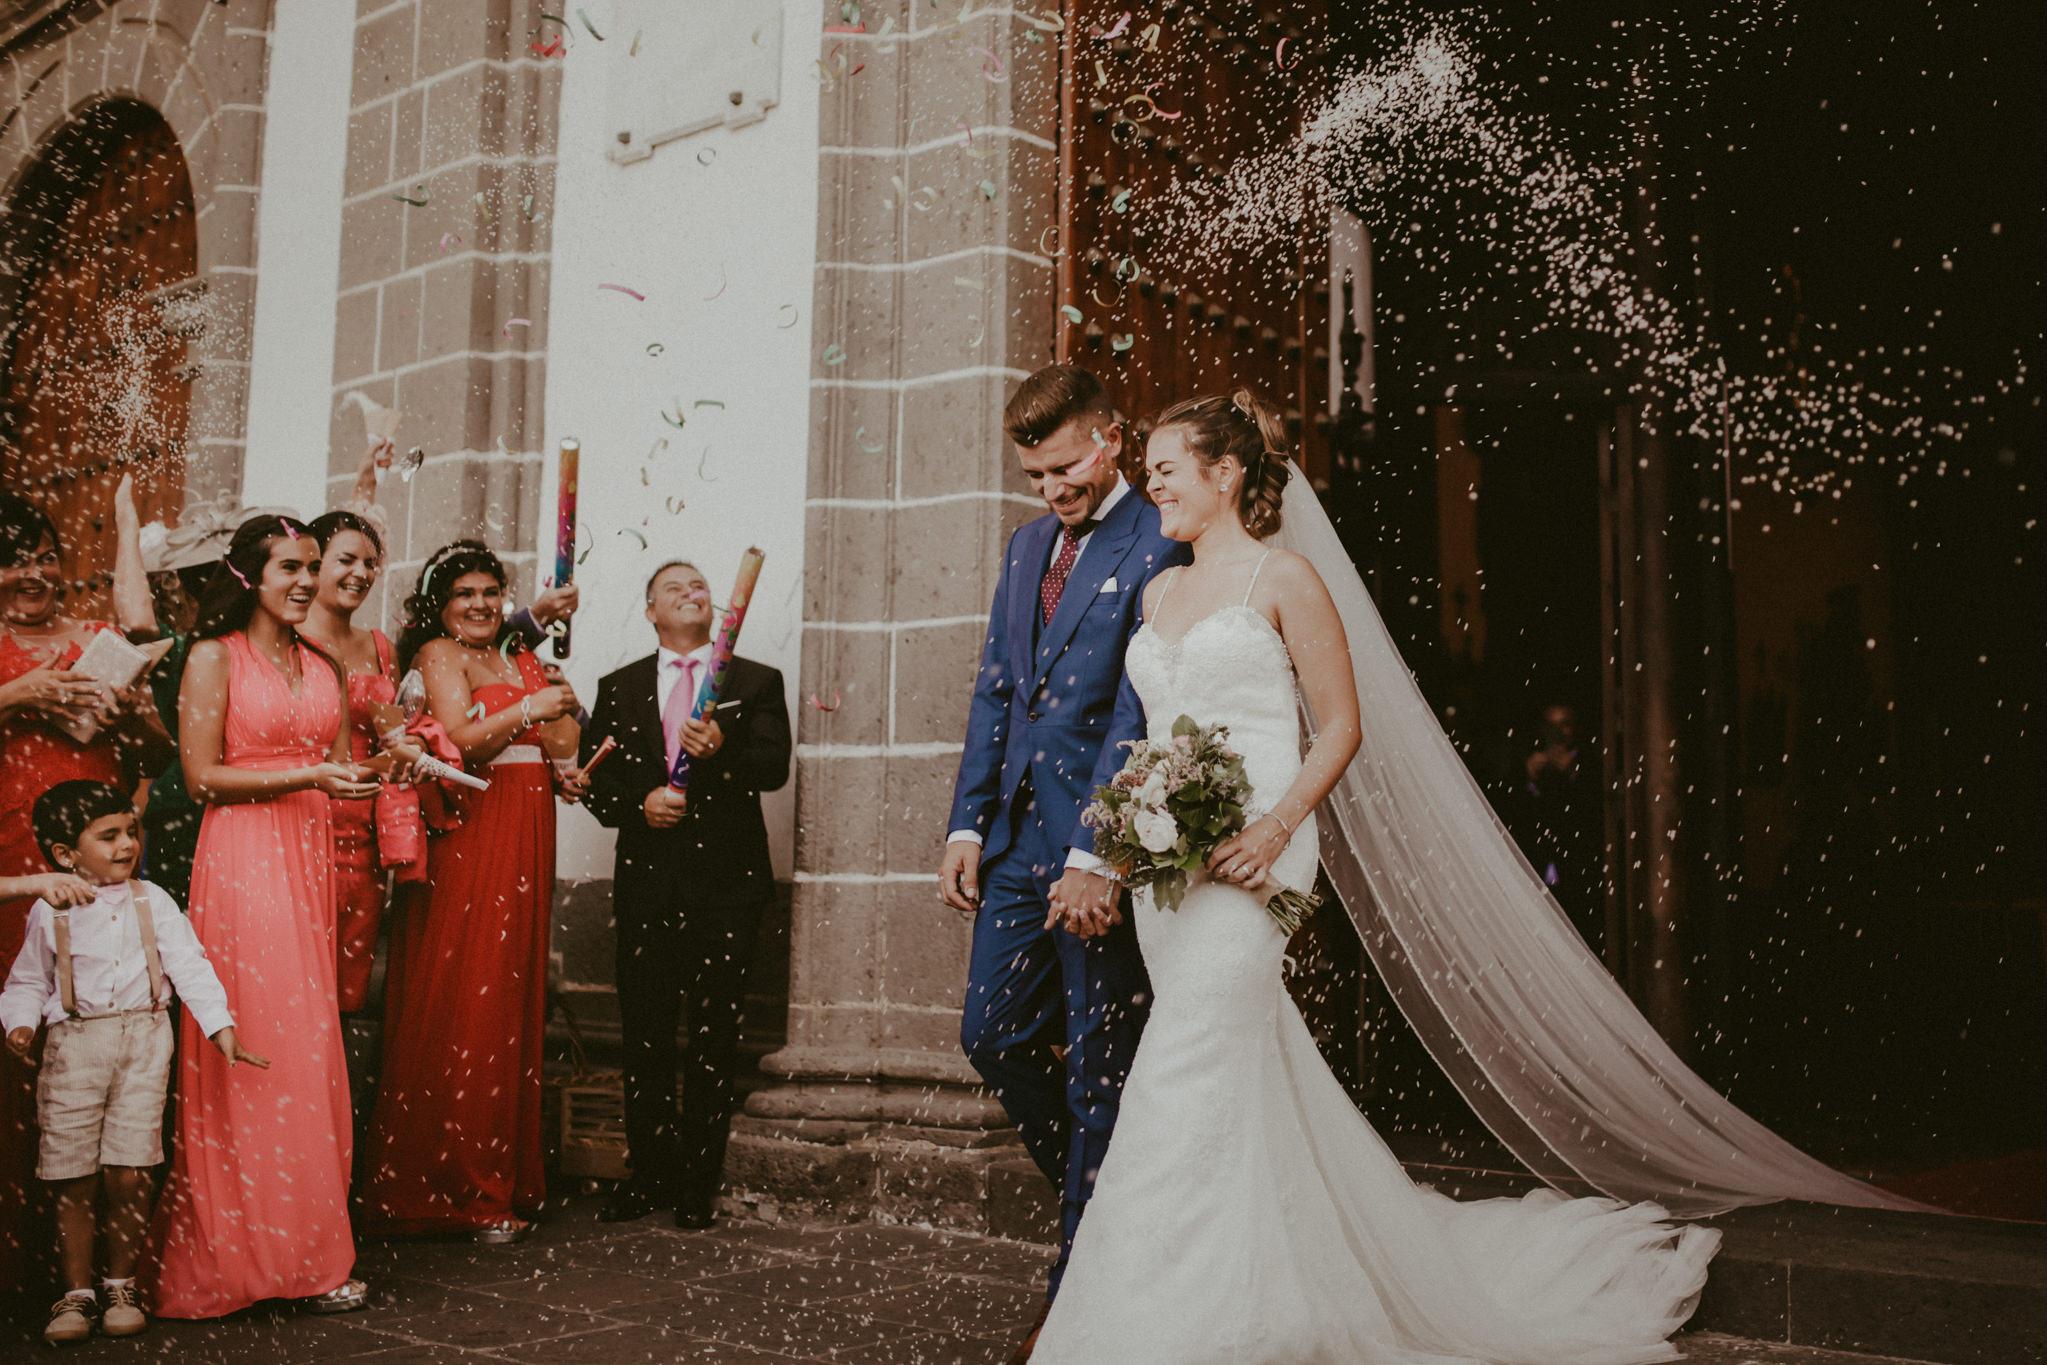 boda-diferente-fotografo-boda-laspalmas-grancanaria-44